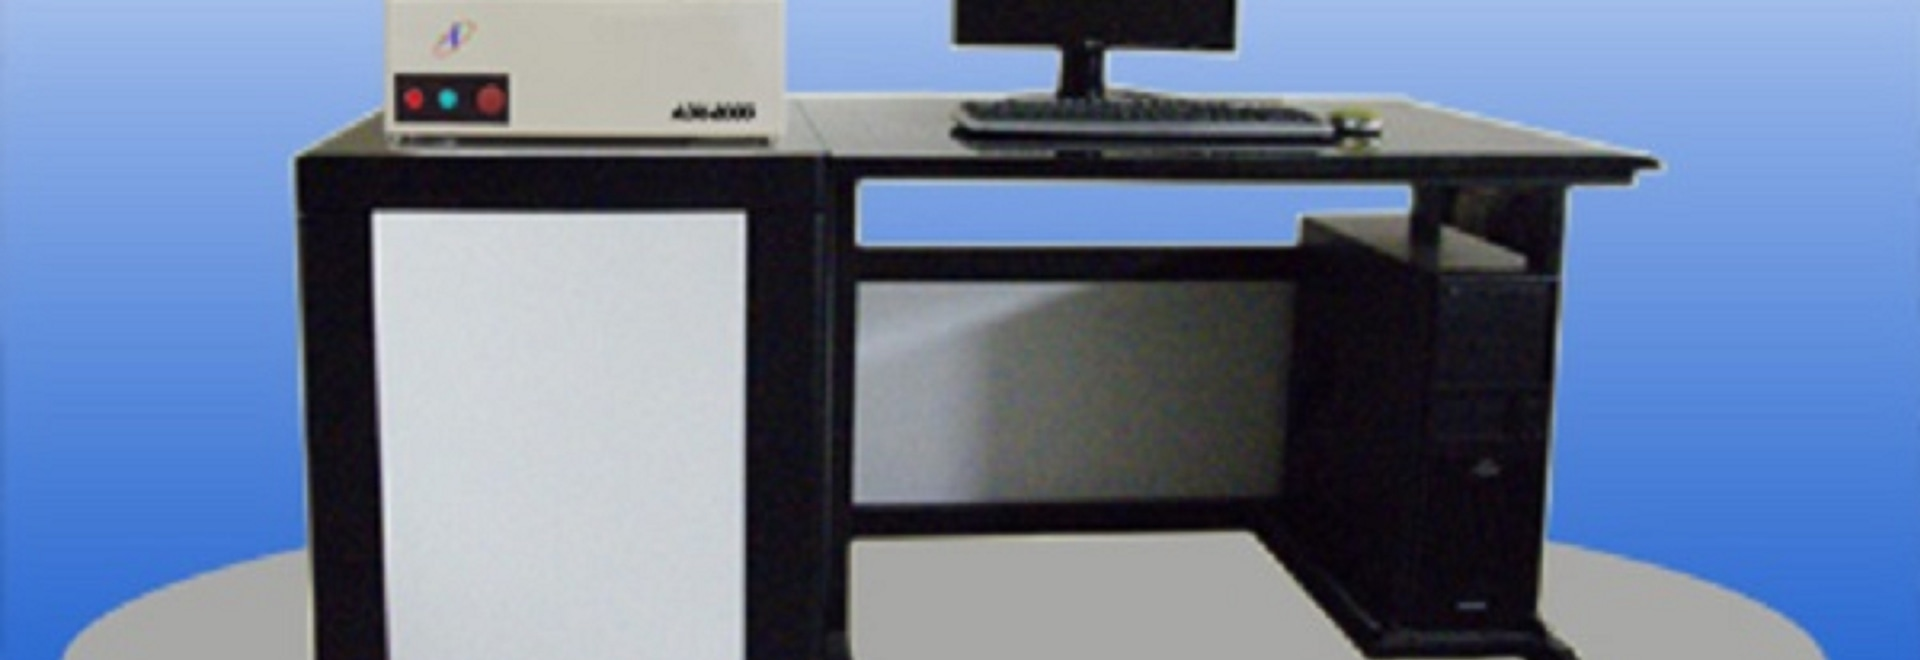 Desktop XRD